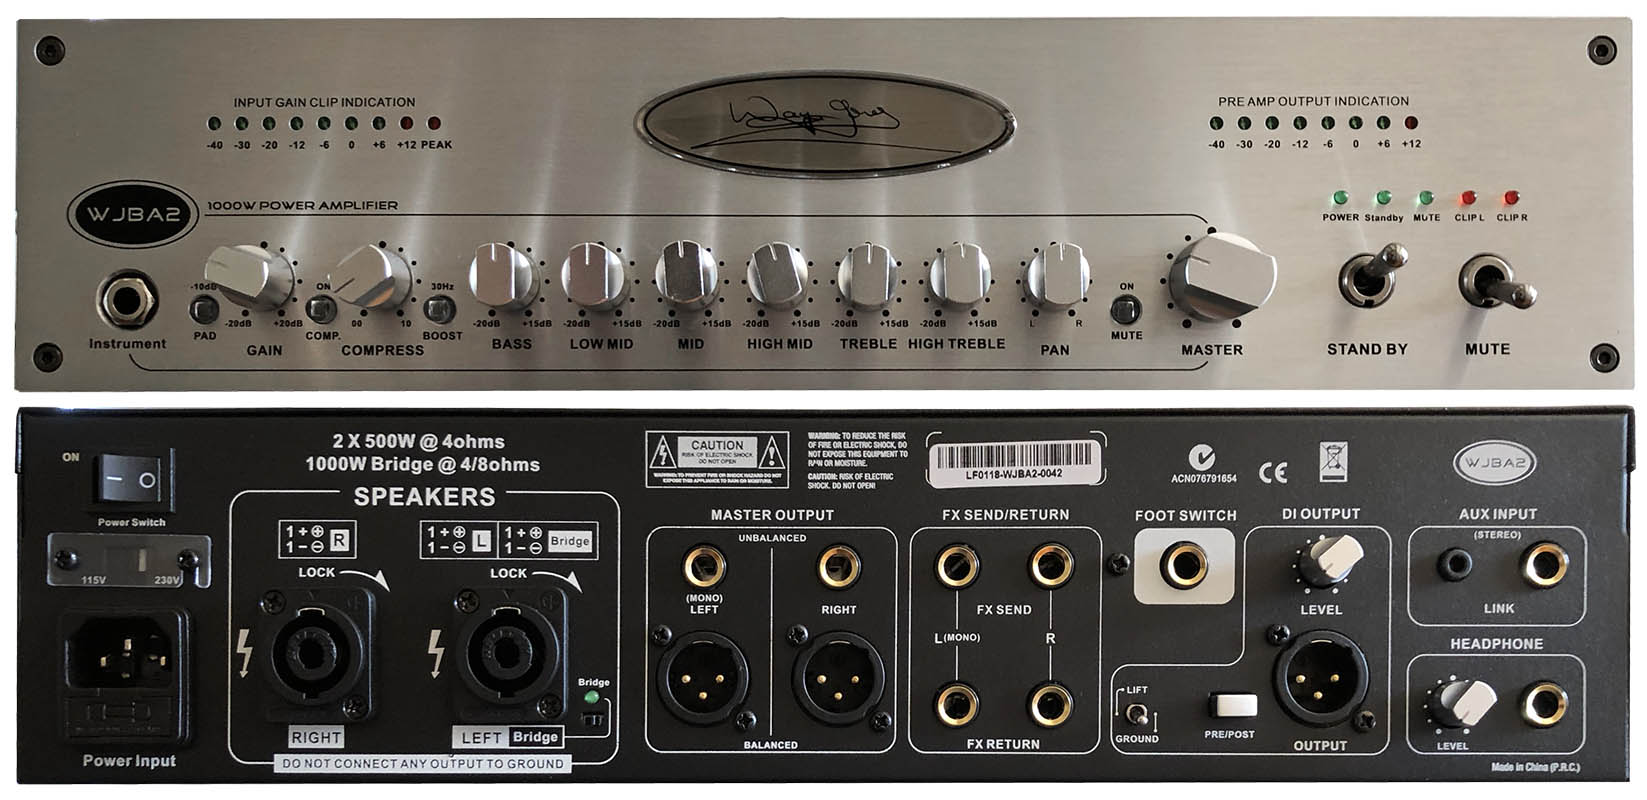 Reviews Industry Wayne Jones Audio 40w 2 Ohm 24w 4 Ohms Bridge Power Amplifier Wjba2 1000 Watt Bass Guitar With 6 Band Eq Pre Amp